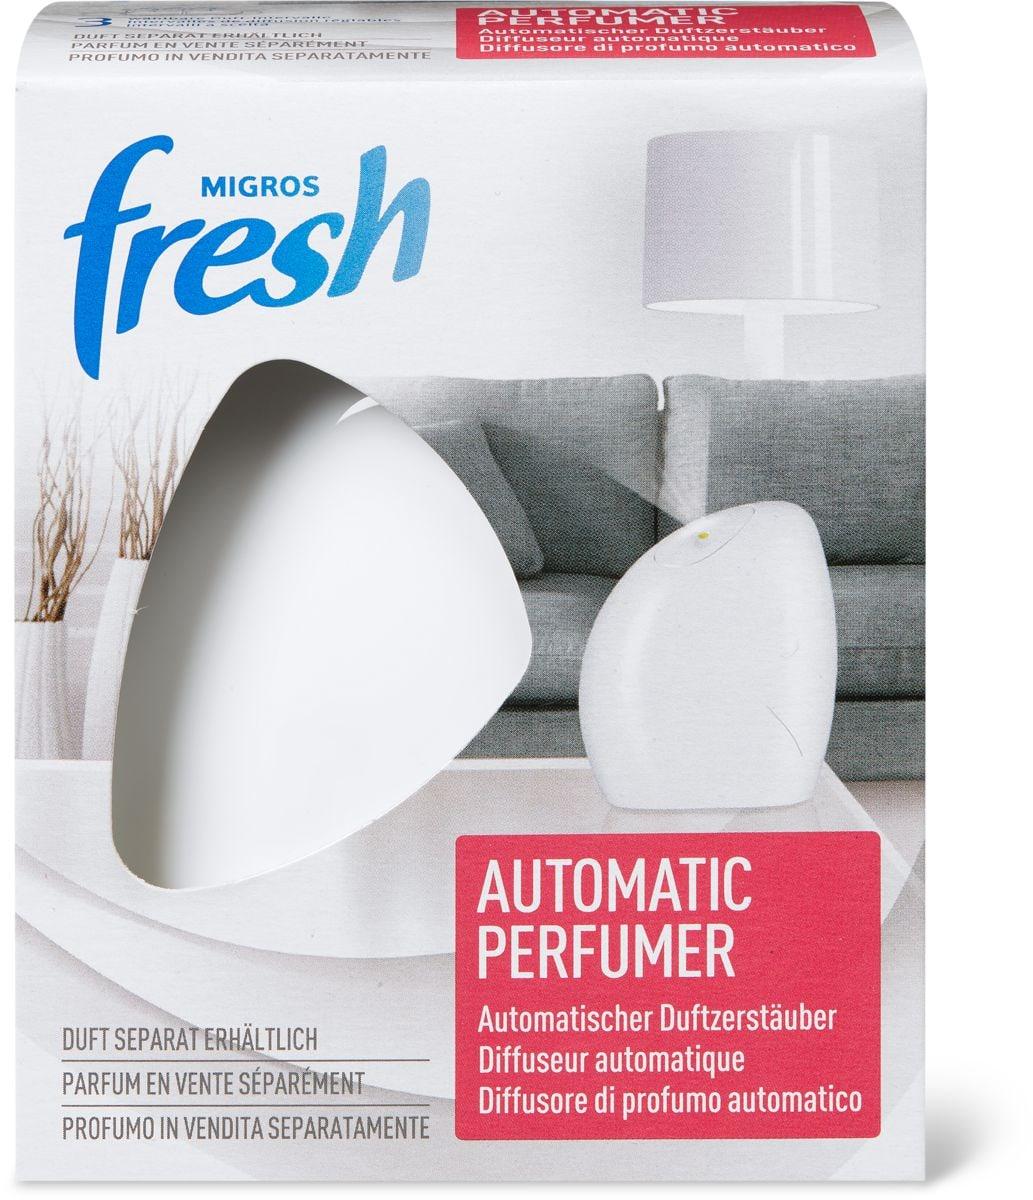 M-Fresh Automatic Duftzerstäuber